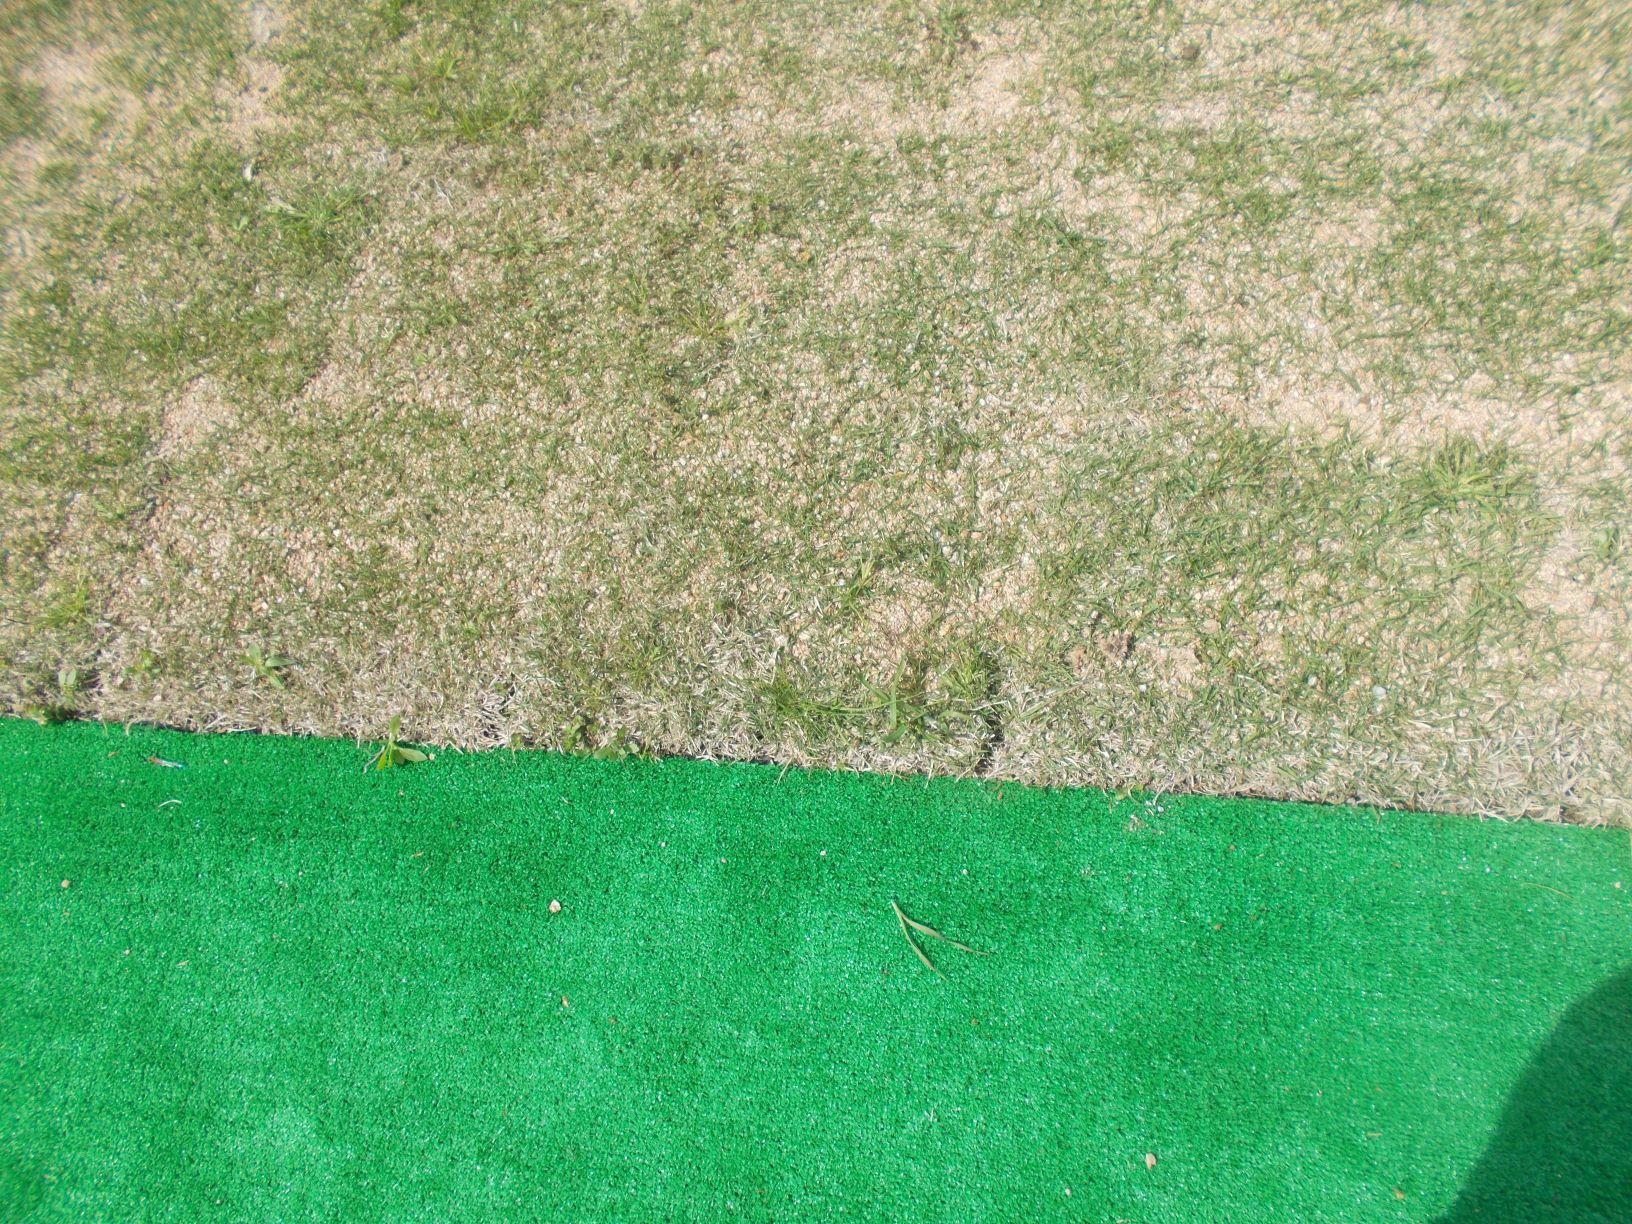 手前が人工芝、おくが天然芝